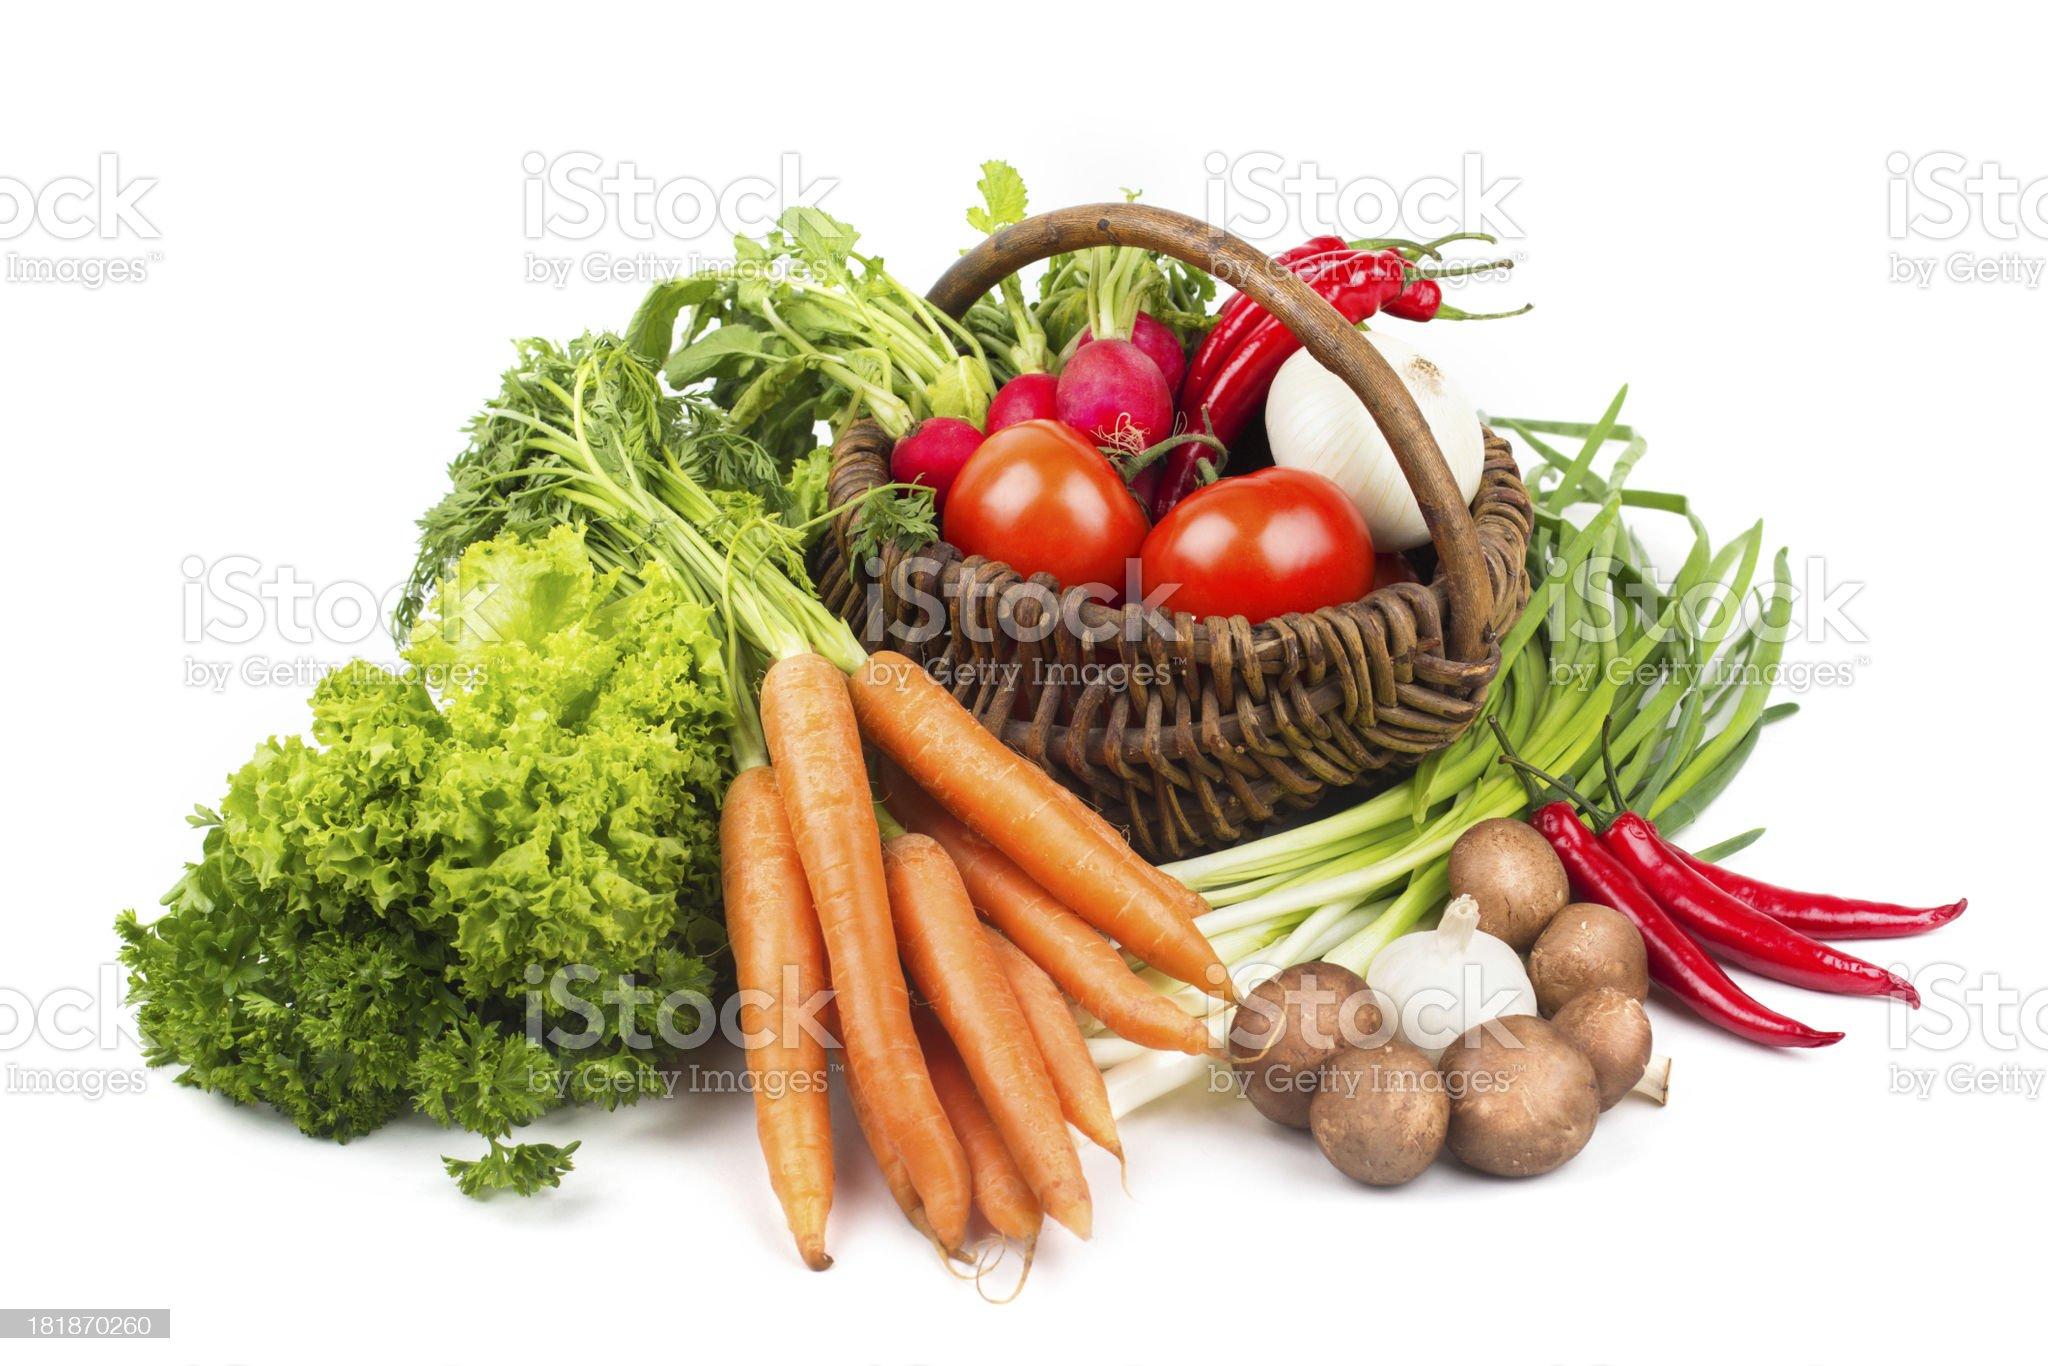 Fresh vegetable mix isolated on white royalty-free stock photo